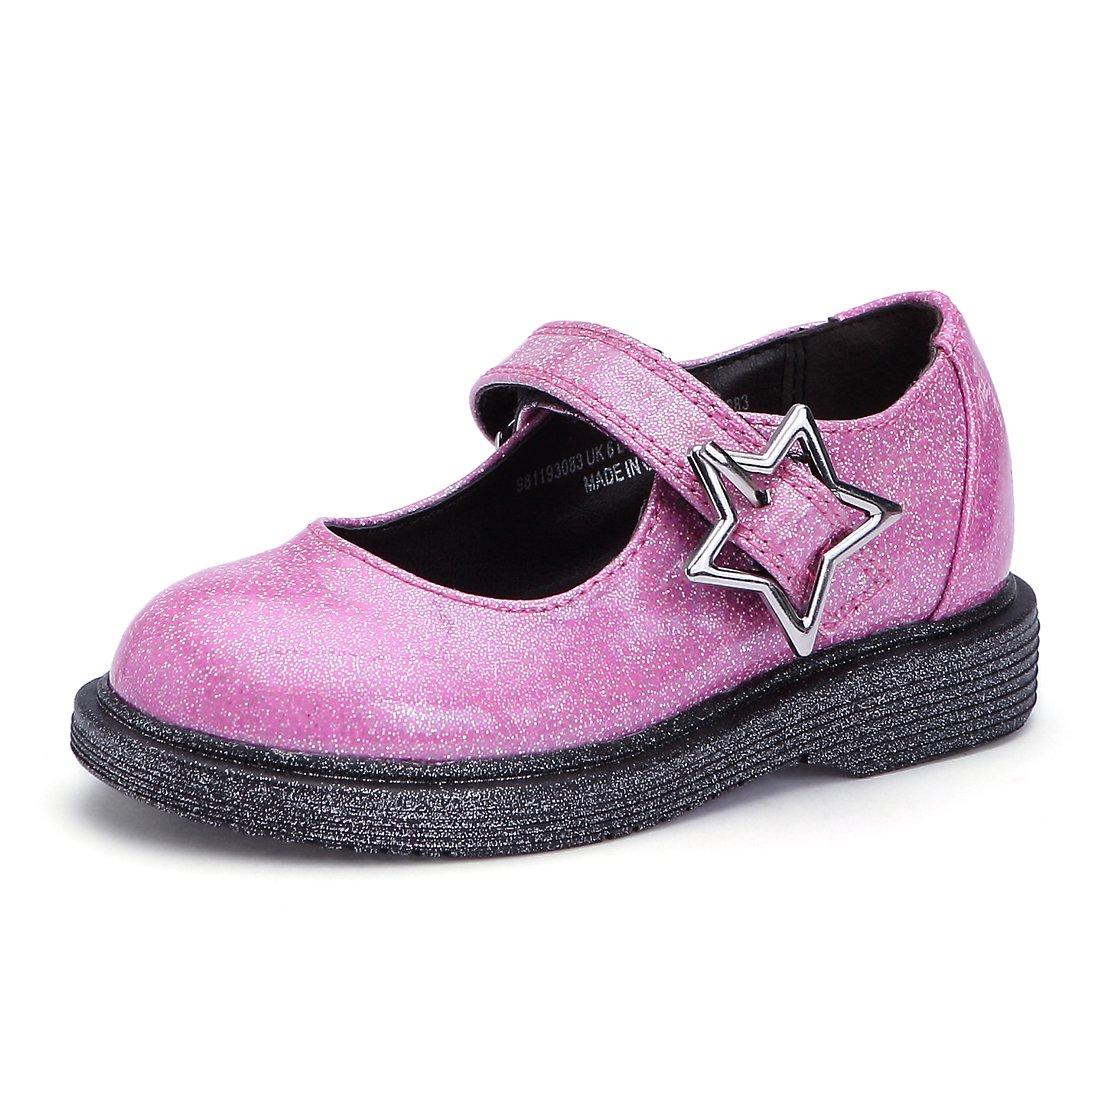 BTDREAM Baby Girl's Glitter Mary Jane Flat Princess Dress Shoes